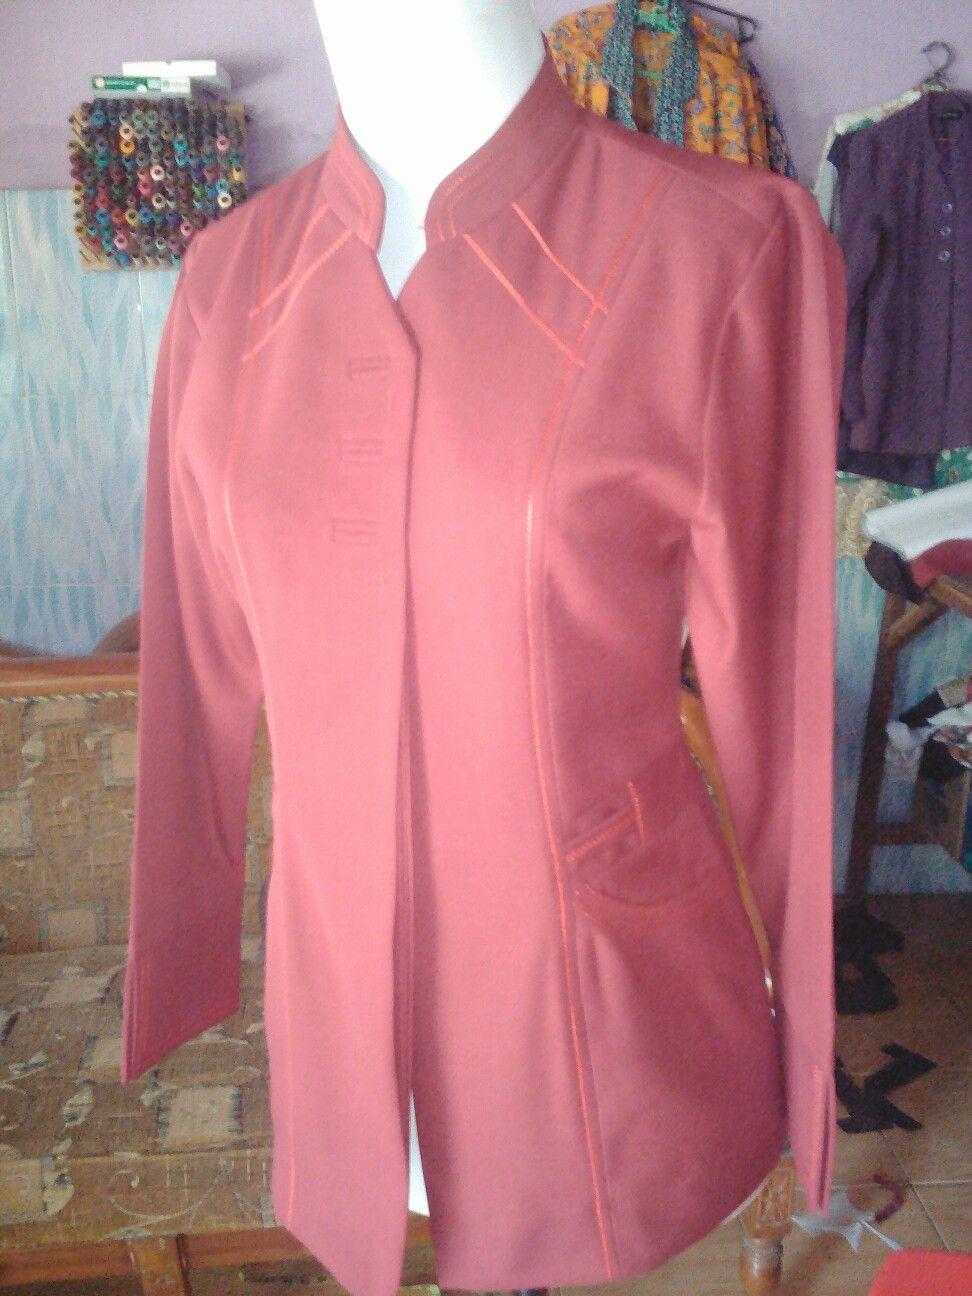 Mengerjakan Jass Blazzer Safari Celana Baju Seragam Kantor Alexis Kulot Rok Sekolah Busana Wanita Juga Melayani Pesanan Jaket Dan Dari Bahan Kain